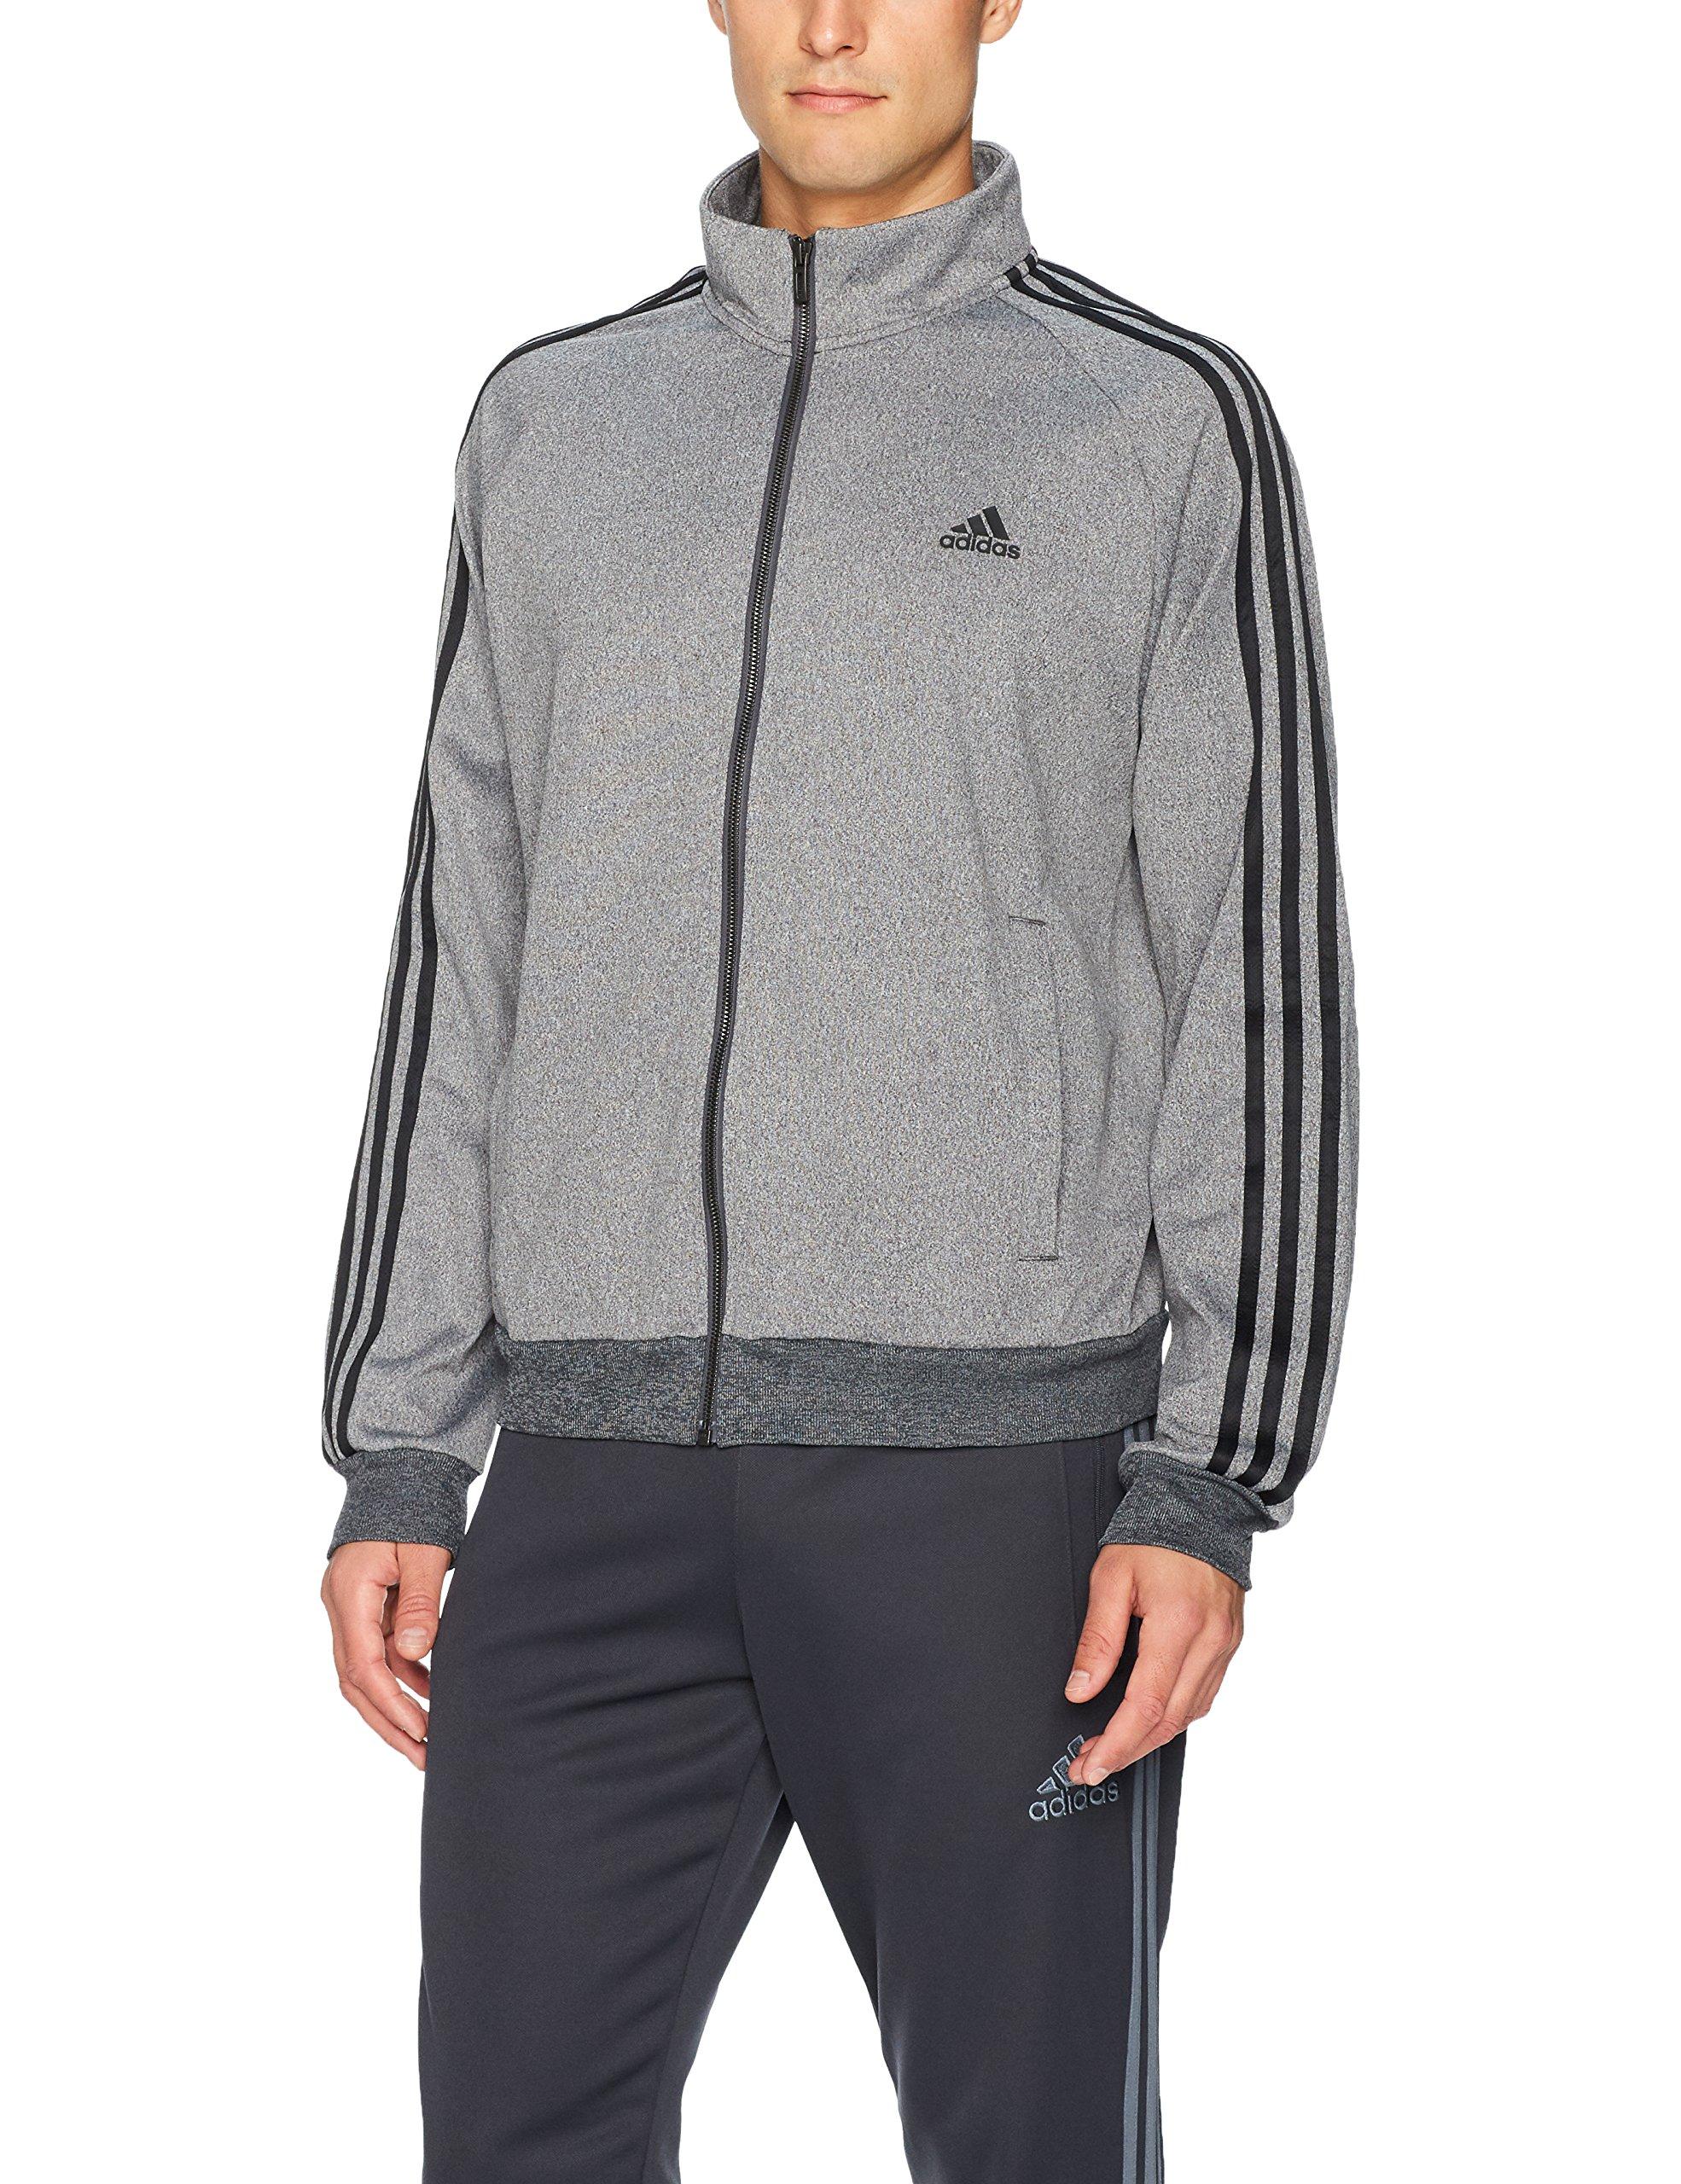 adidas Men's Essentials 3-Stripe Tricot Track Jacket, Dark Grey/Black, XX-Large by adidas